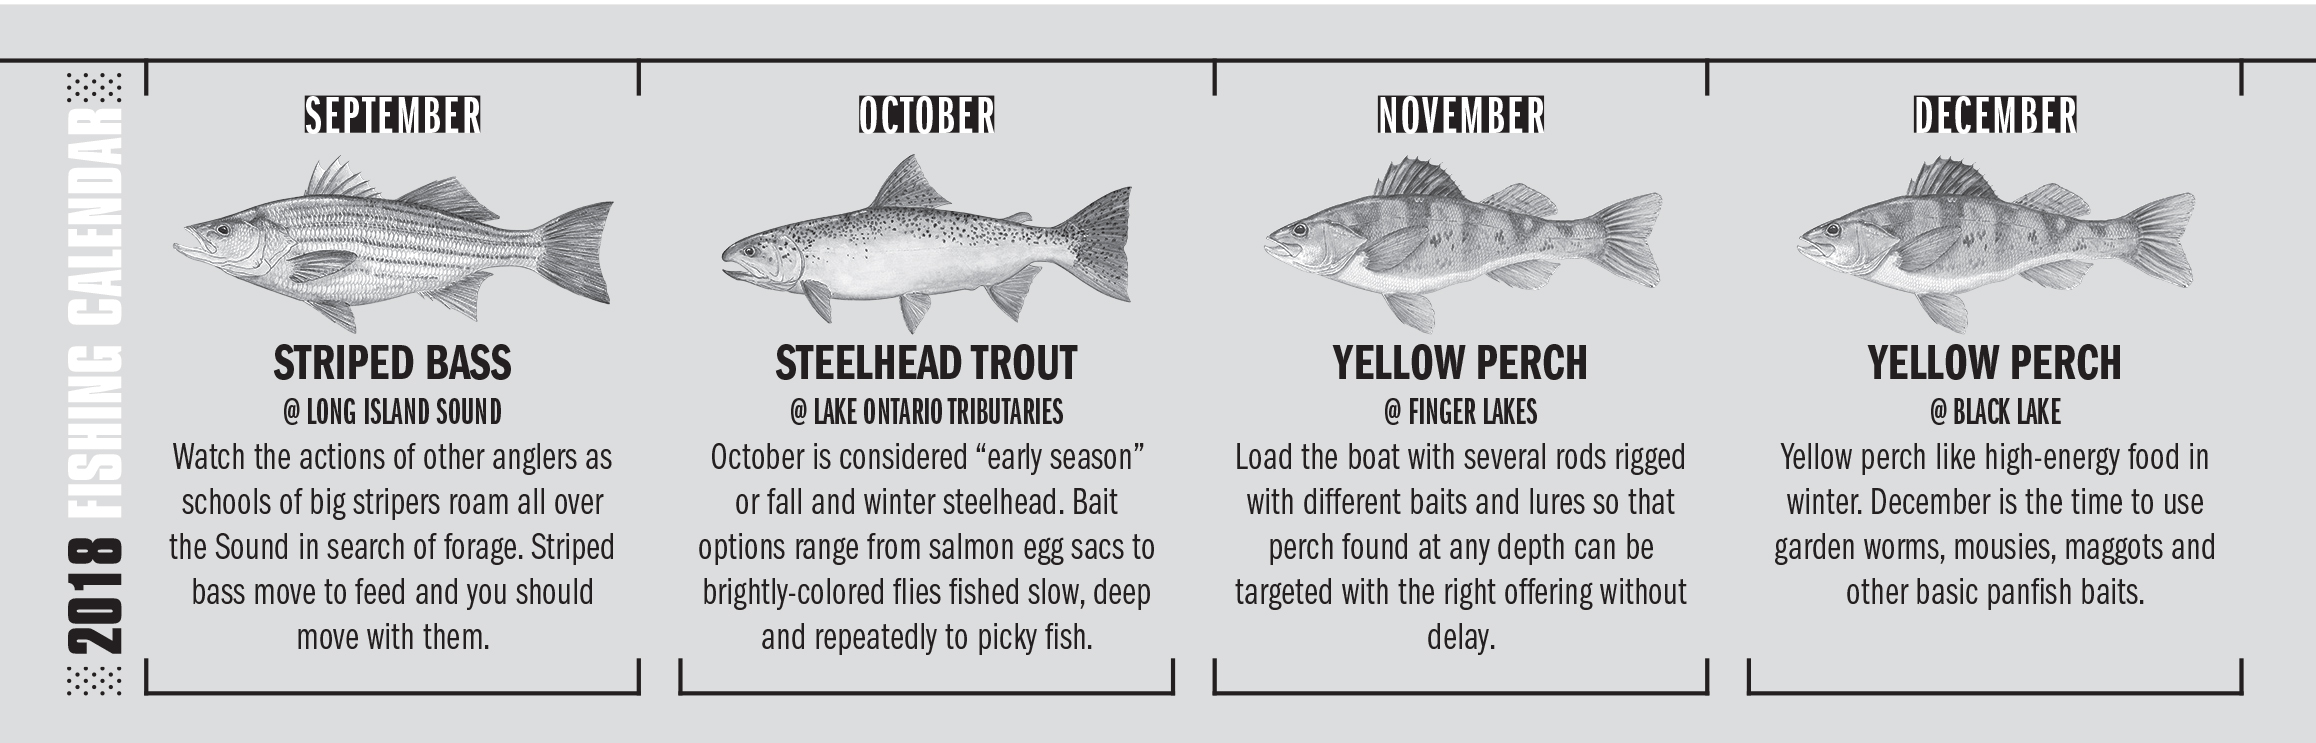 2018 New York Fishing Calendar